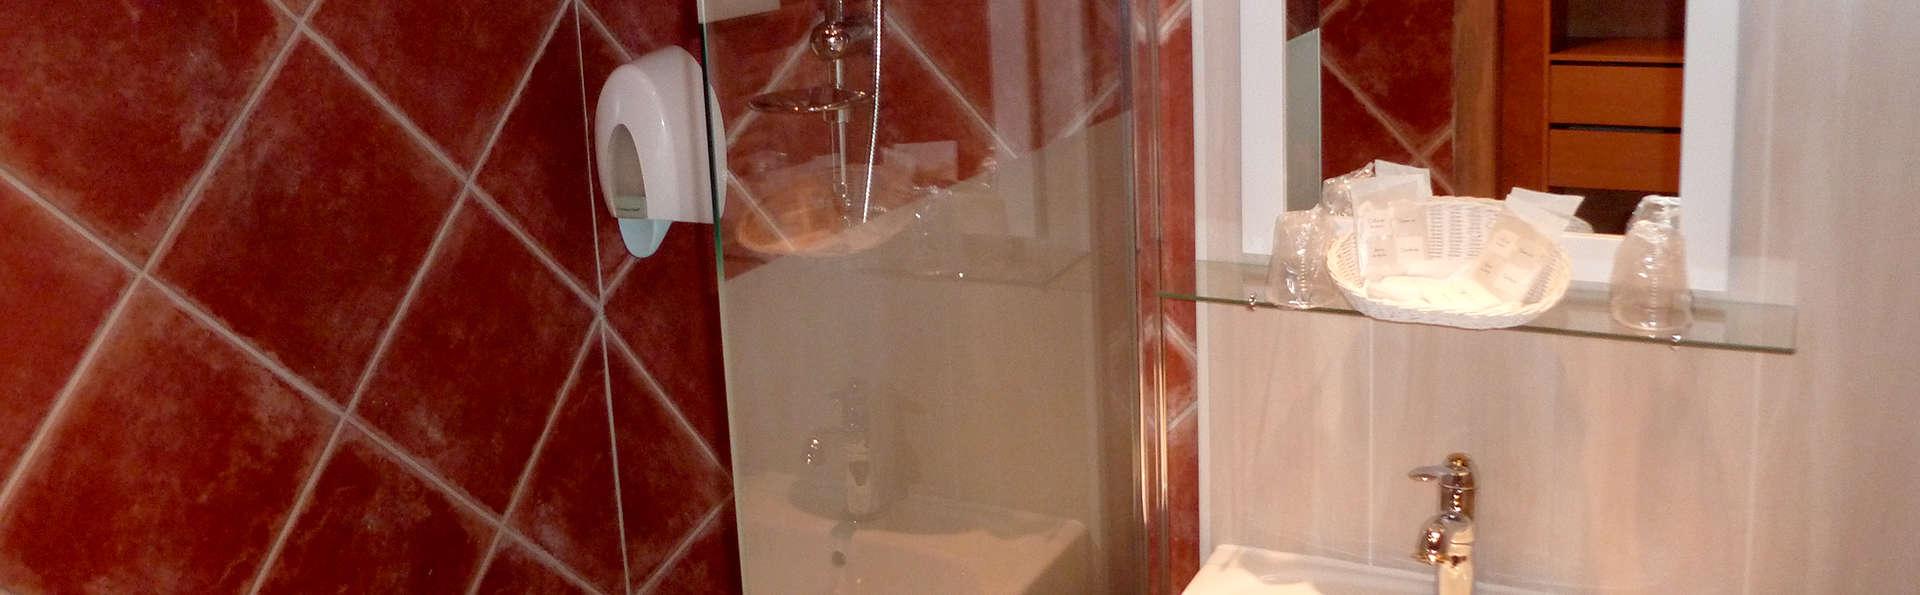 Hôtel Restaurant Les Pins - Edit_Bathroom.jpg